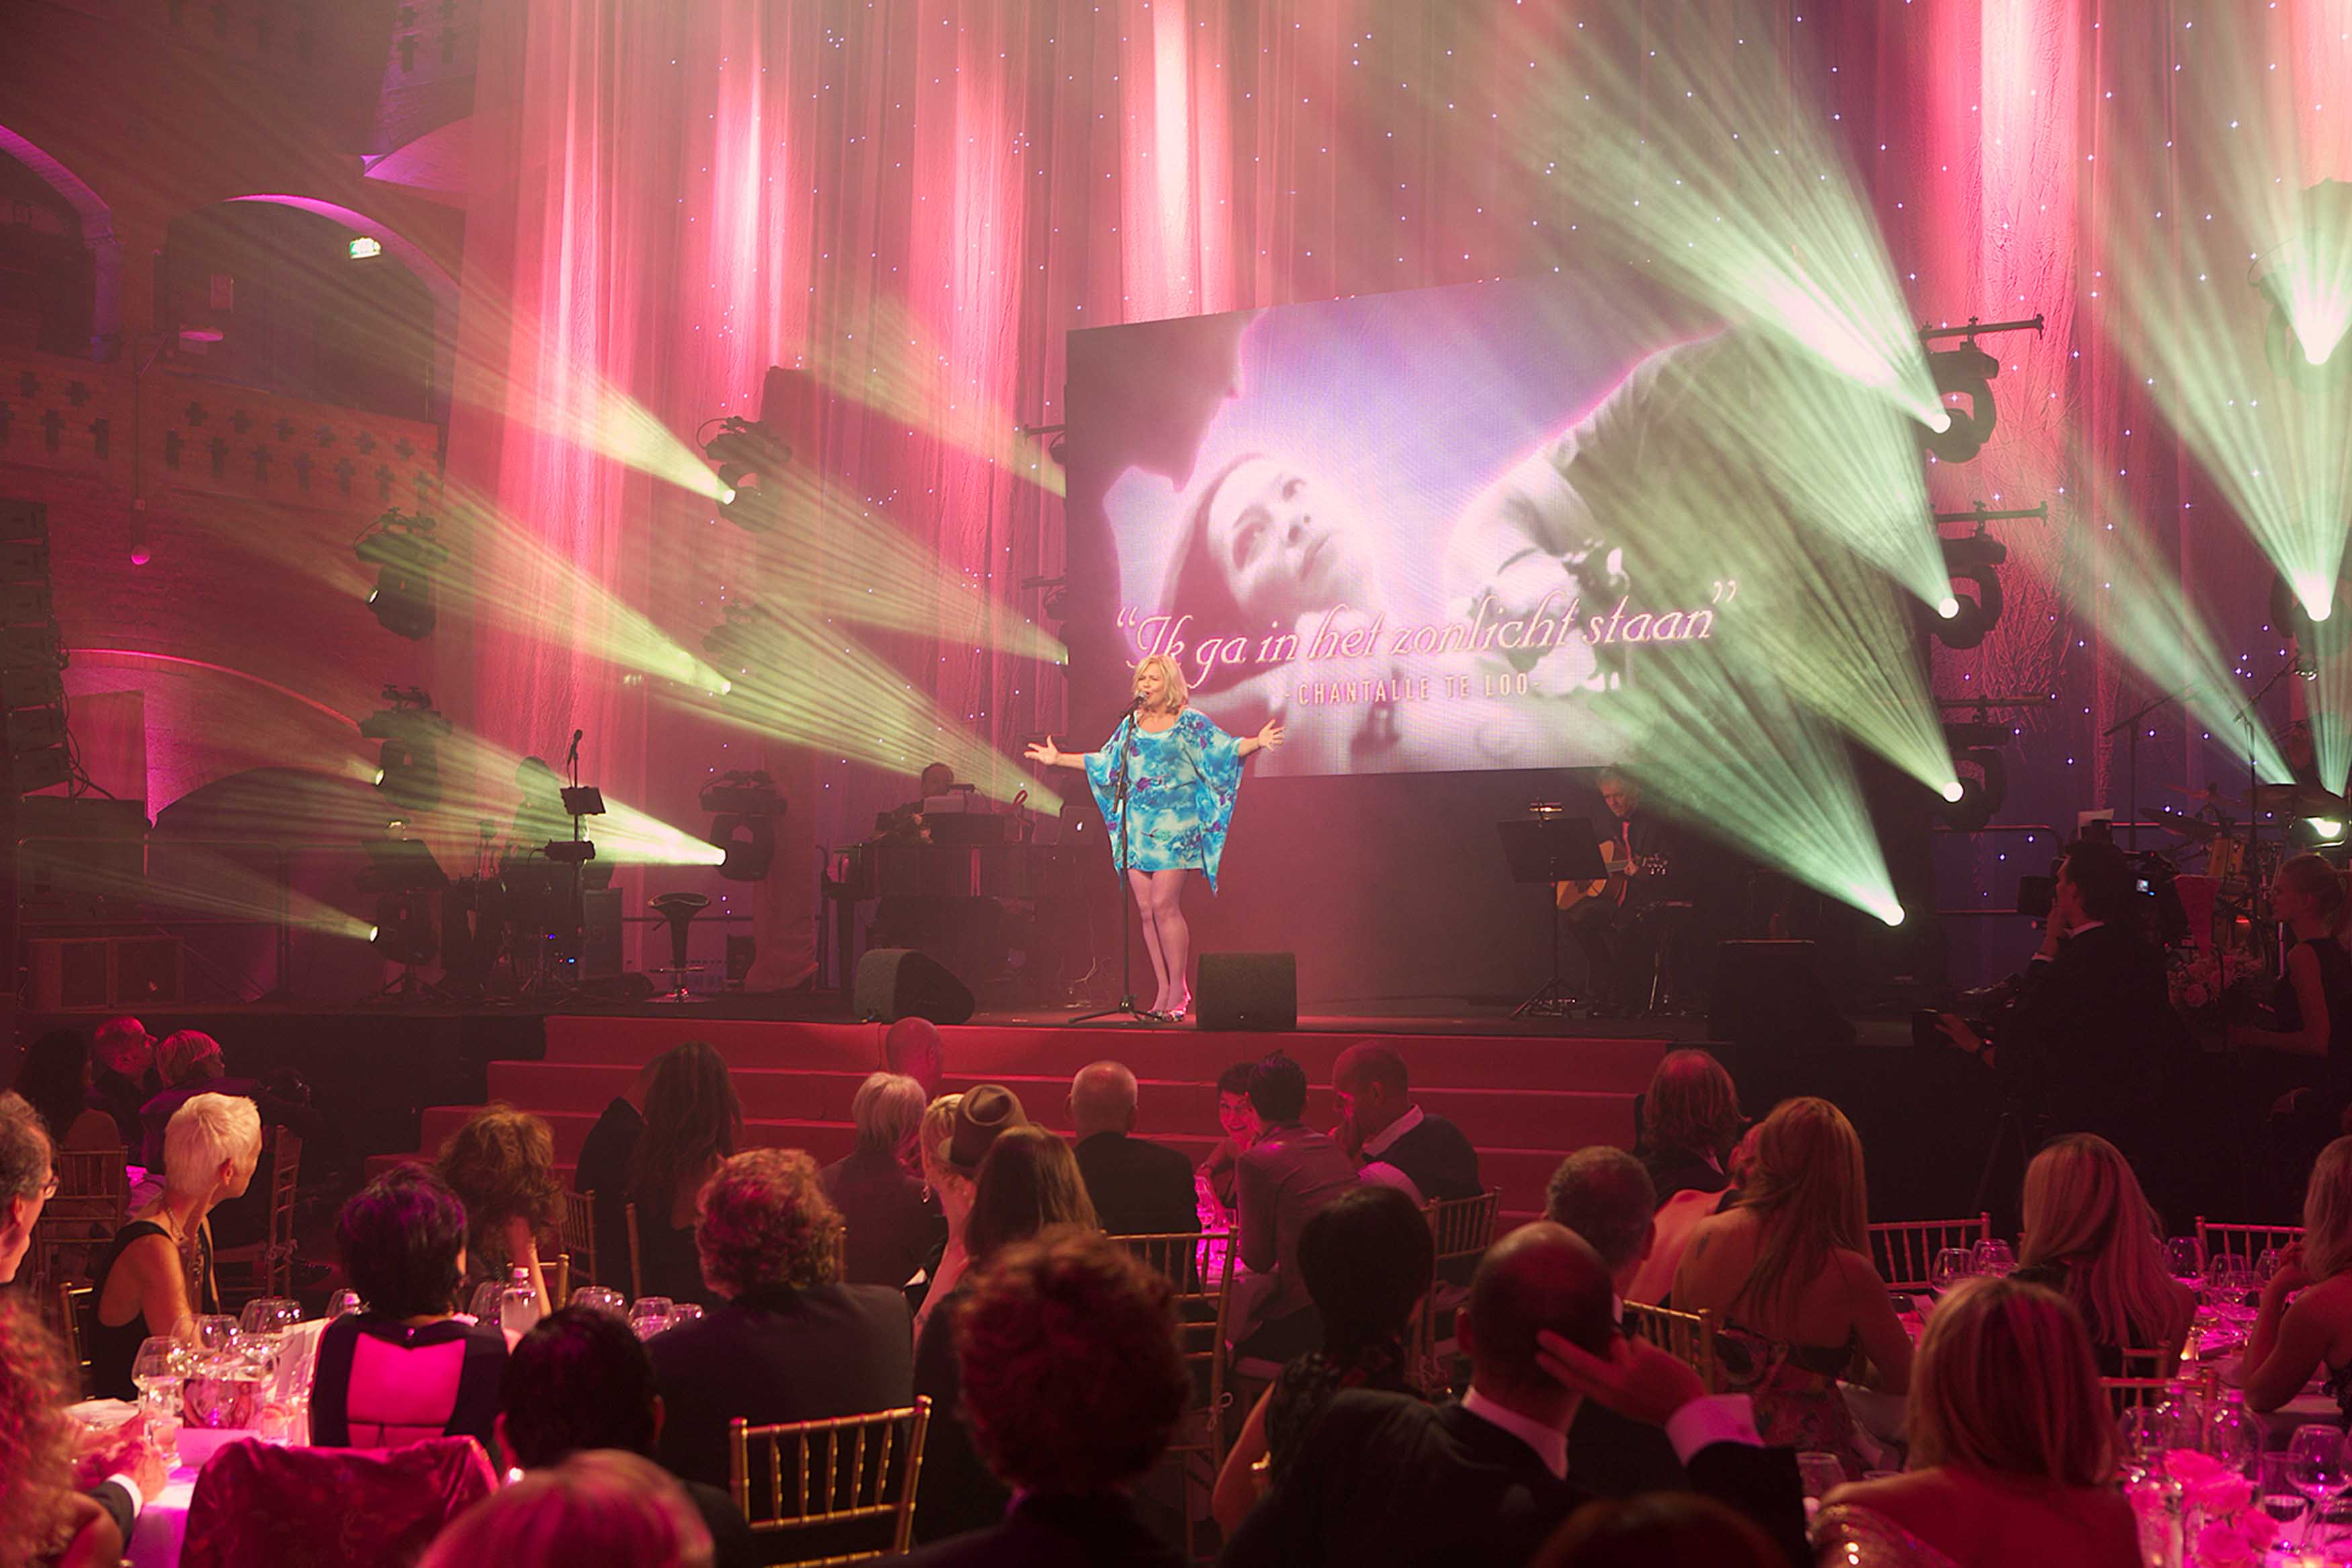 Estee Lauder Pink Ribbon Award Gala